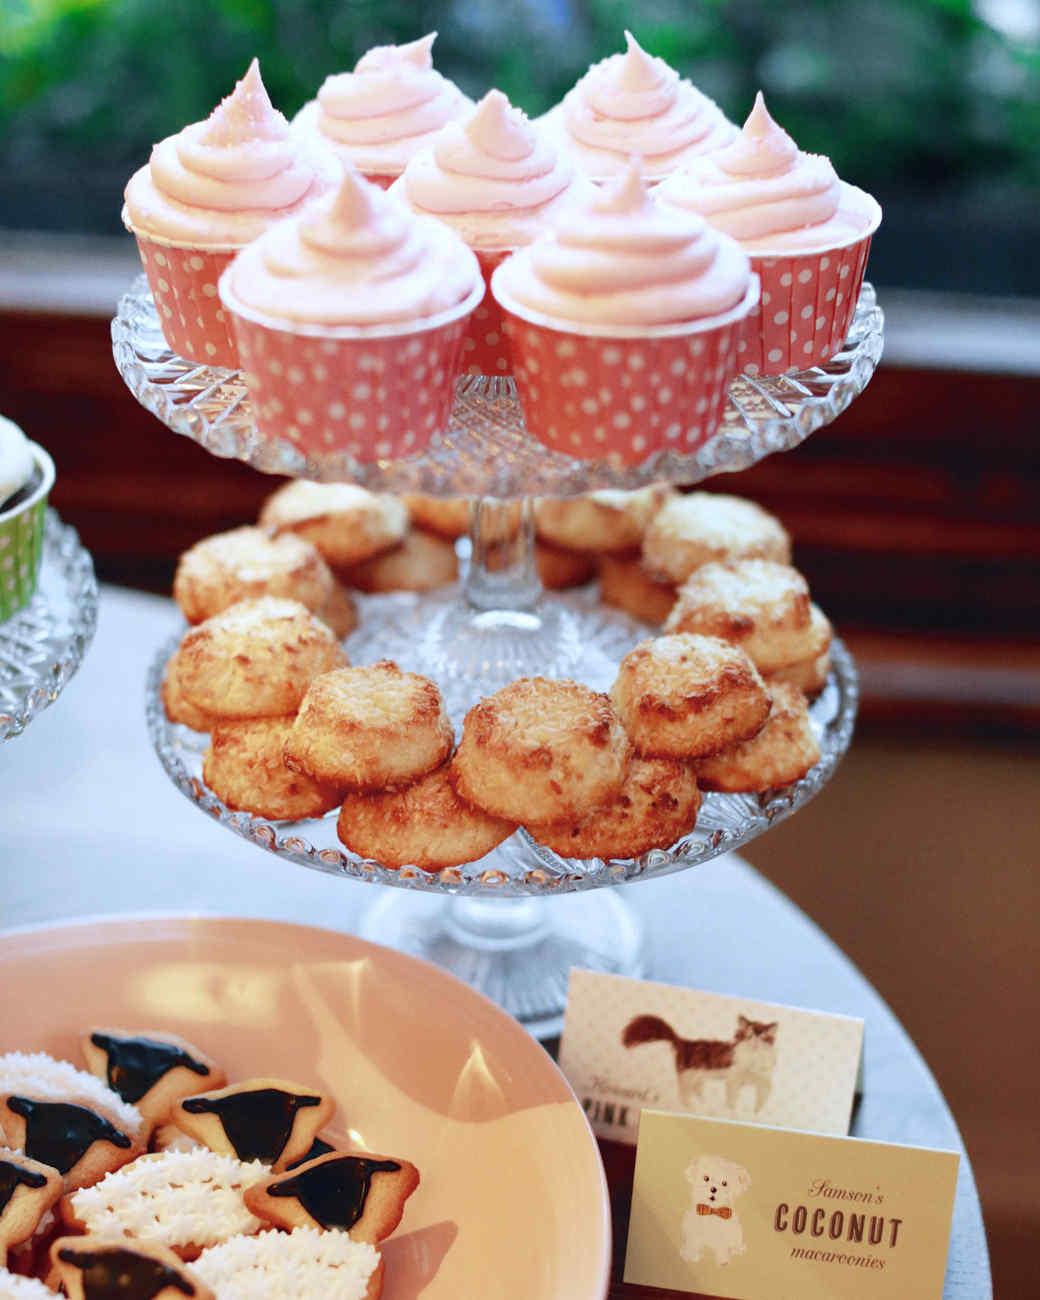 macaroons-cupcakes-mary-harrington-baby-shower-094-jan13.jpg